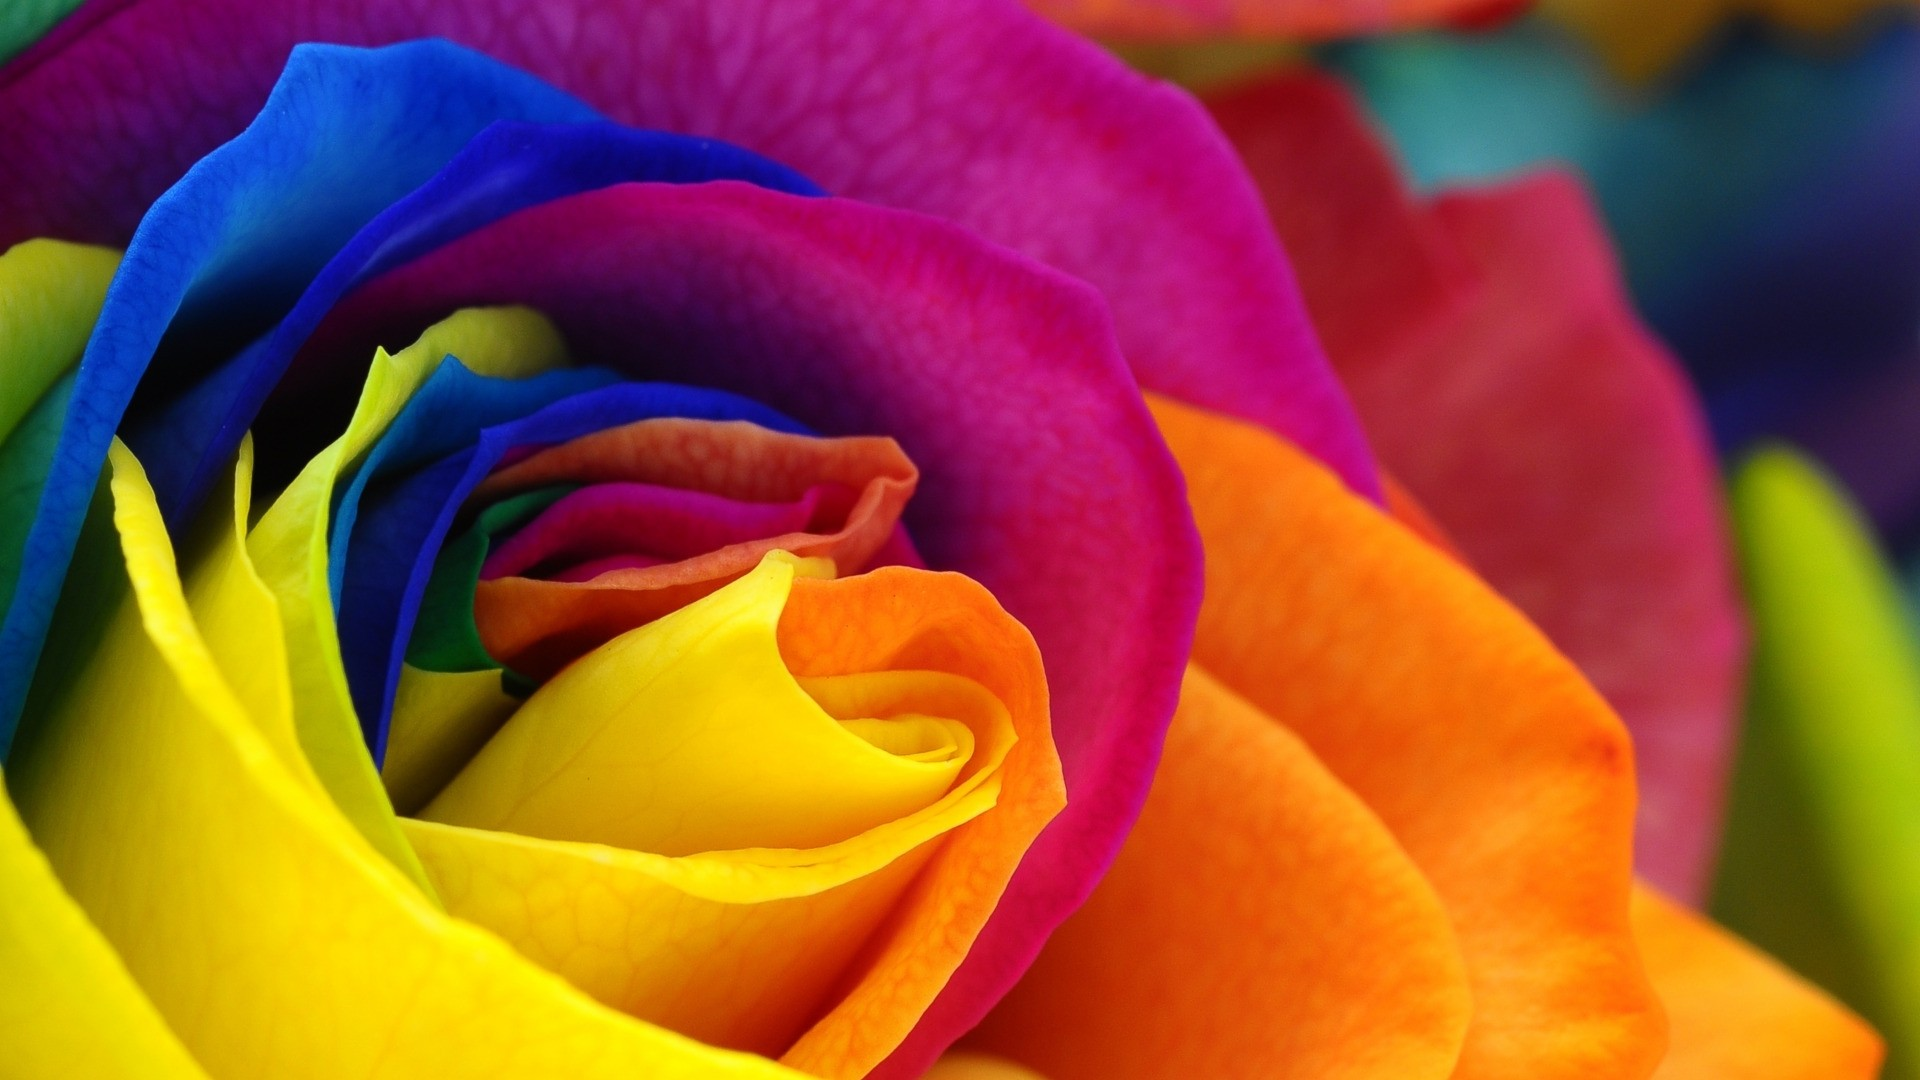 Rainbow Rose Picture